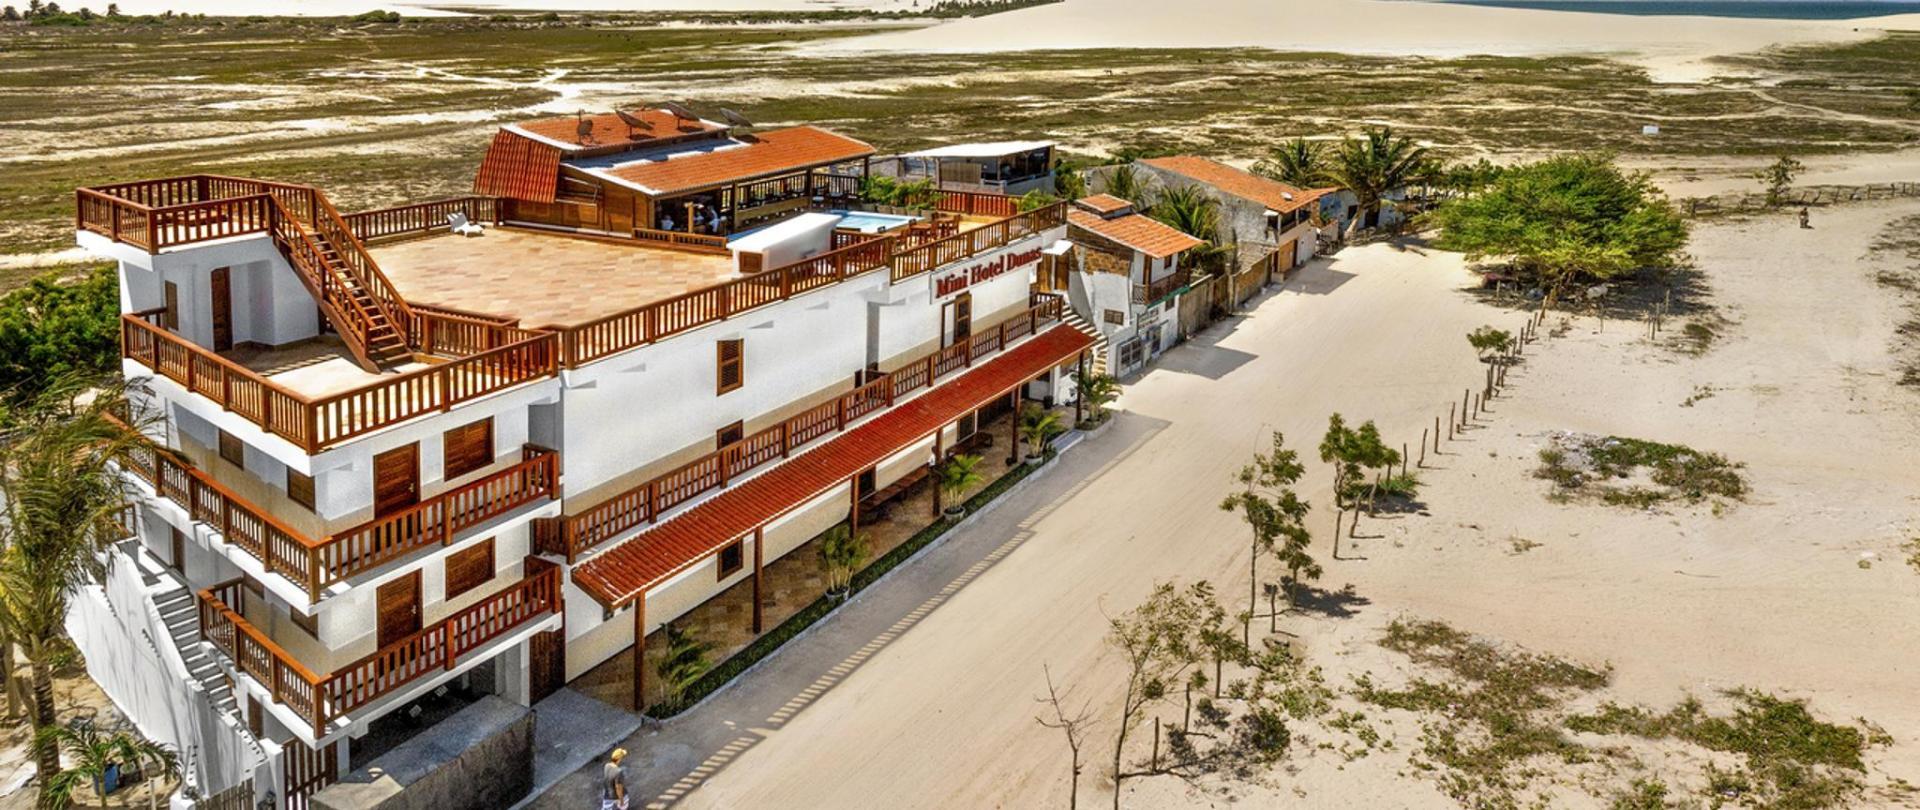 mini_hotel_dunas_001b.jpg